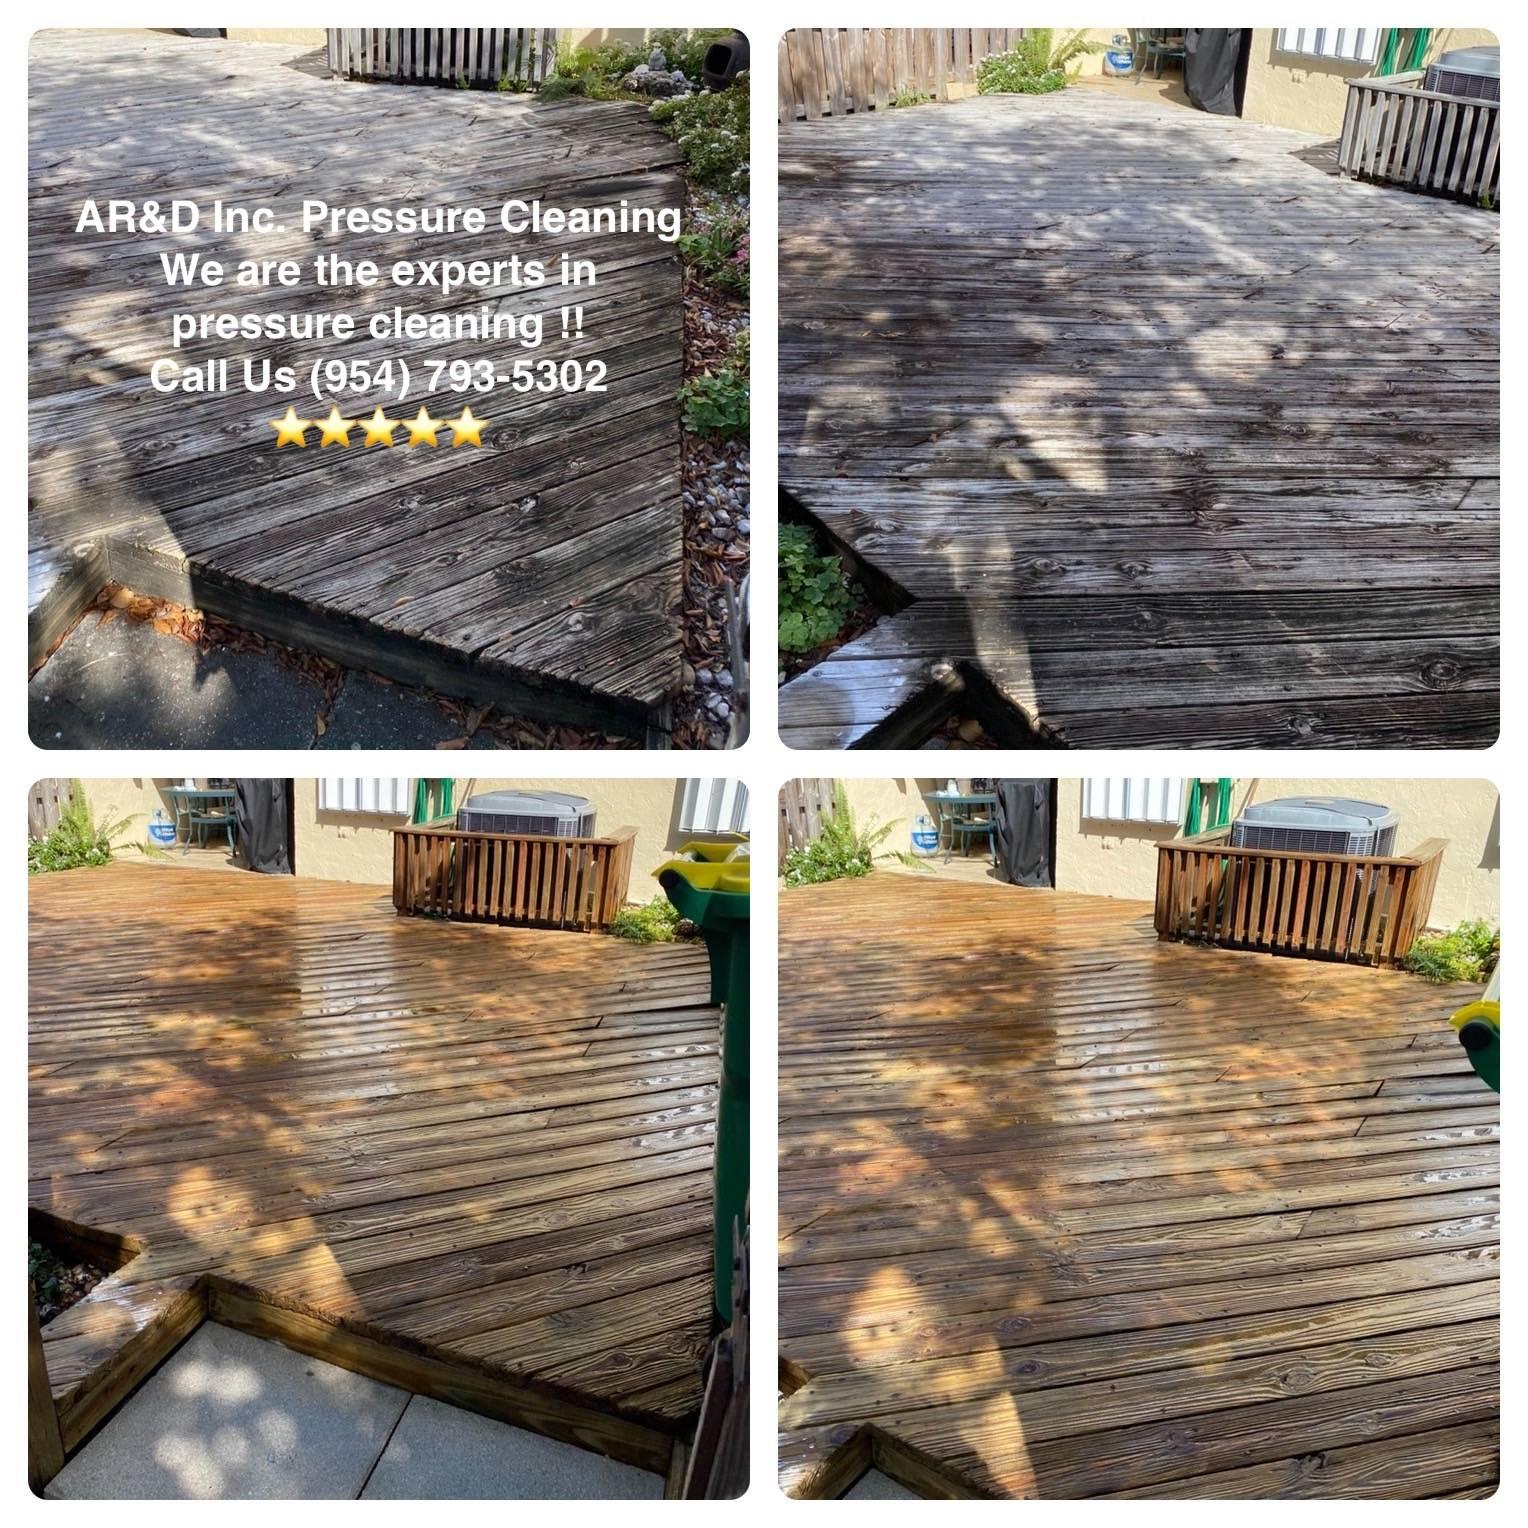 Wood Deck, Pressure Cleaning